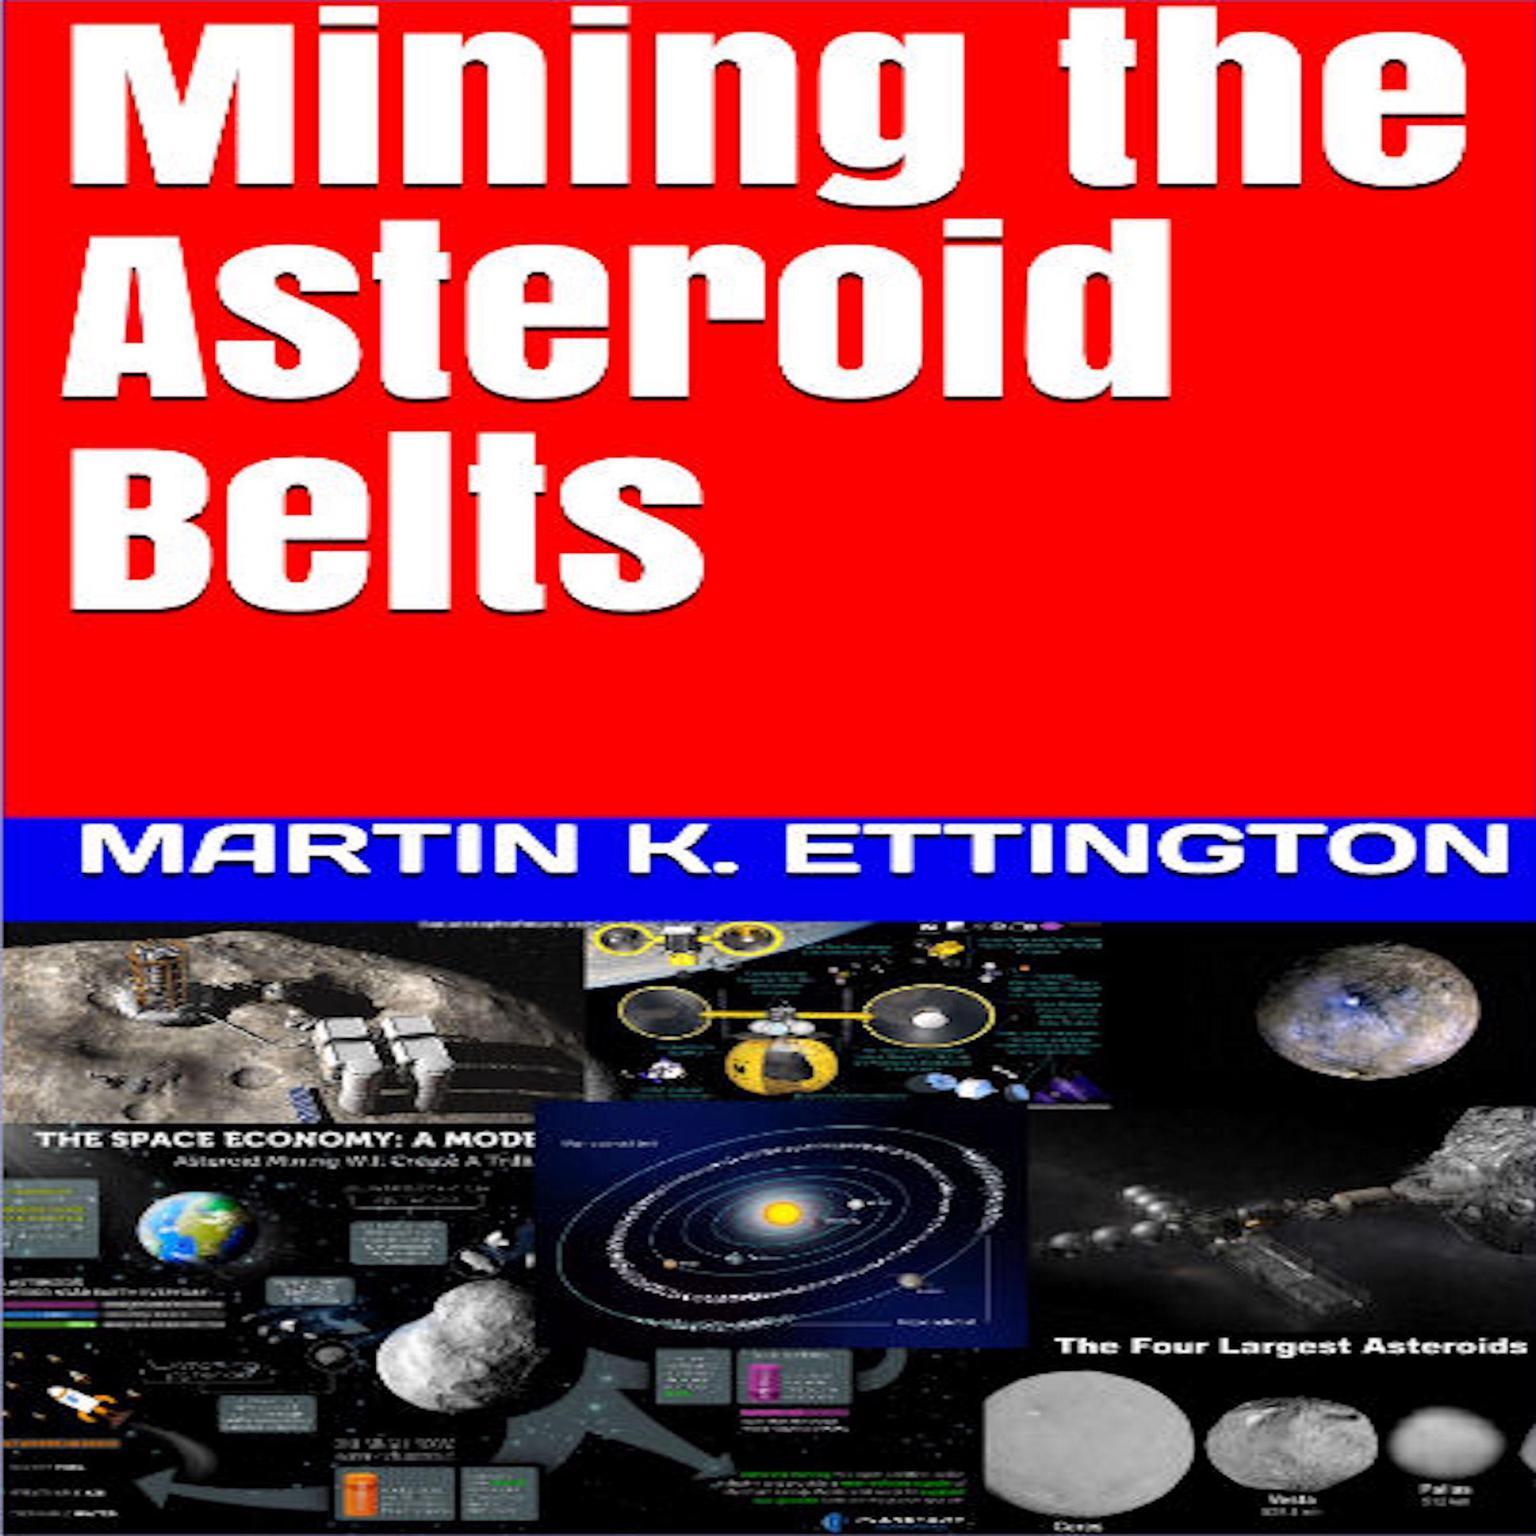 Mining the Asteroid Belts Audiobook, by Martin K. Ettington